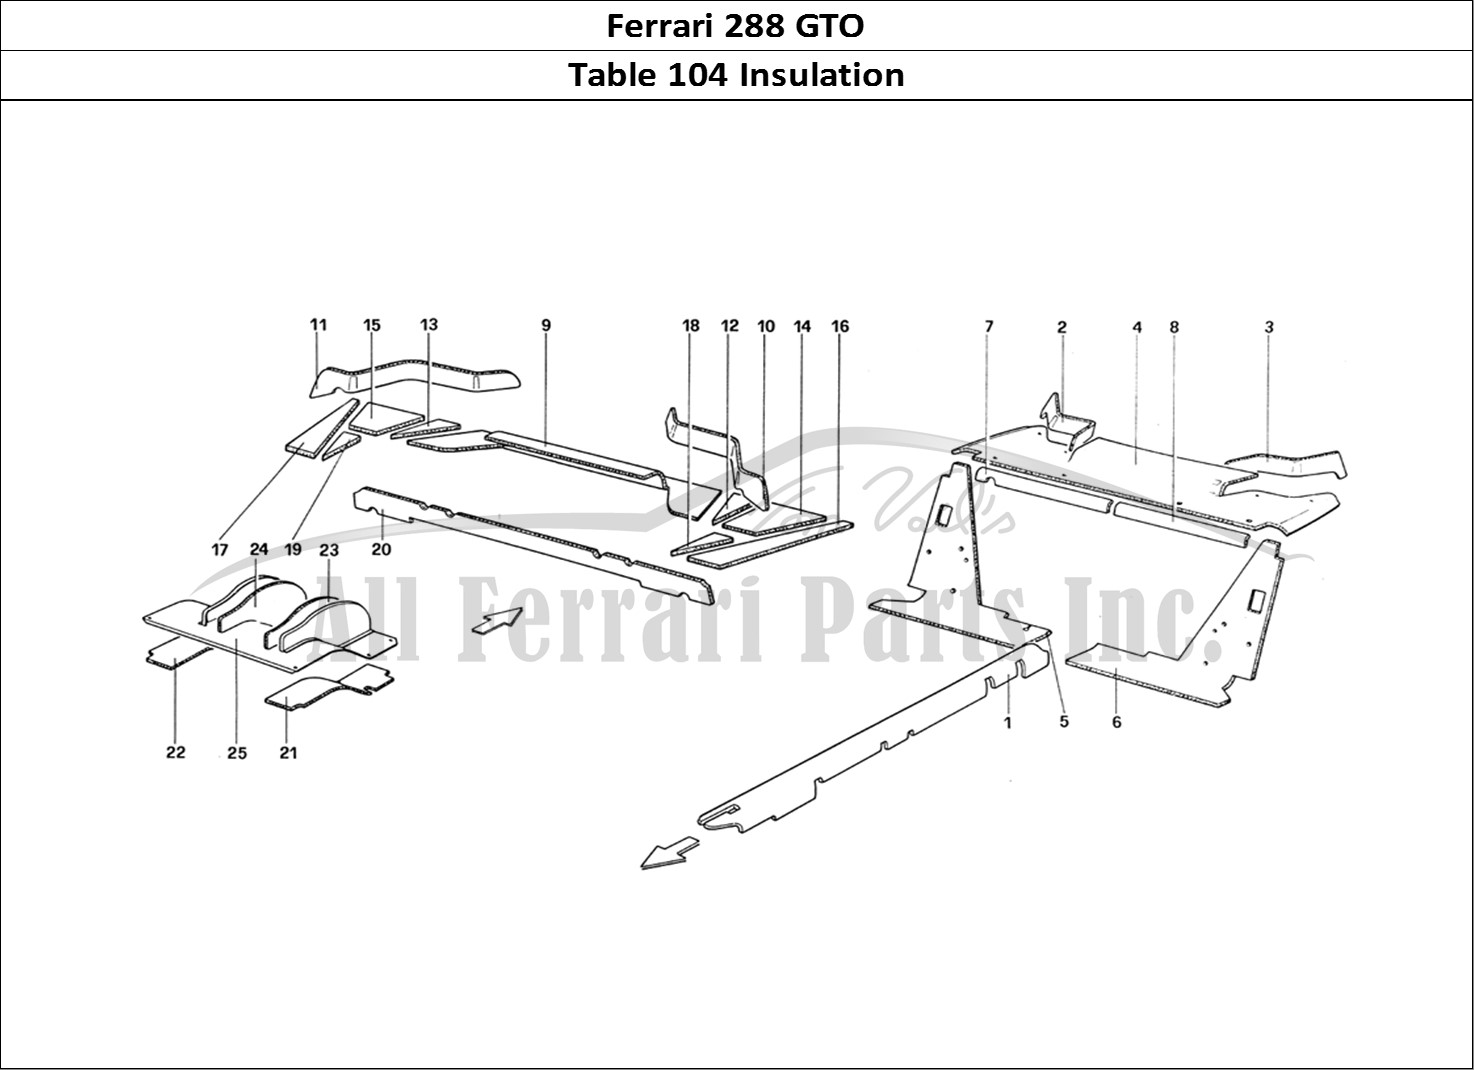 Buy Original Ferrari 288 Gto 104 Insulation Ferrari Parts